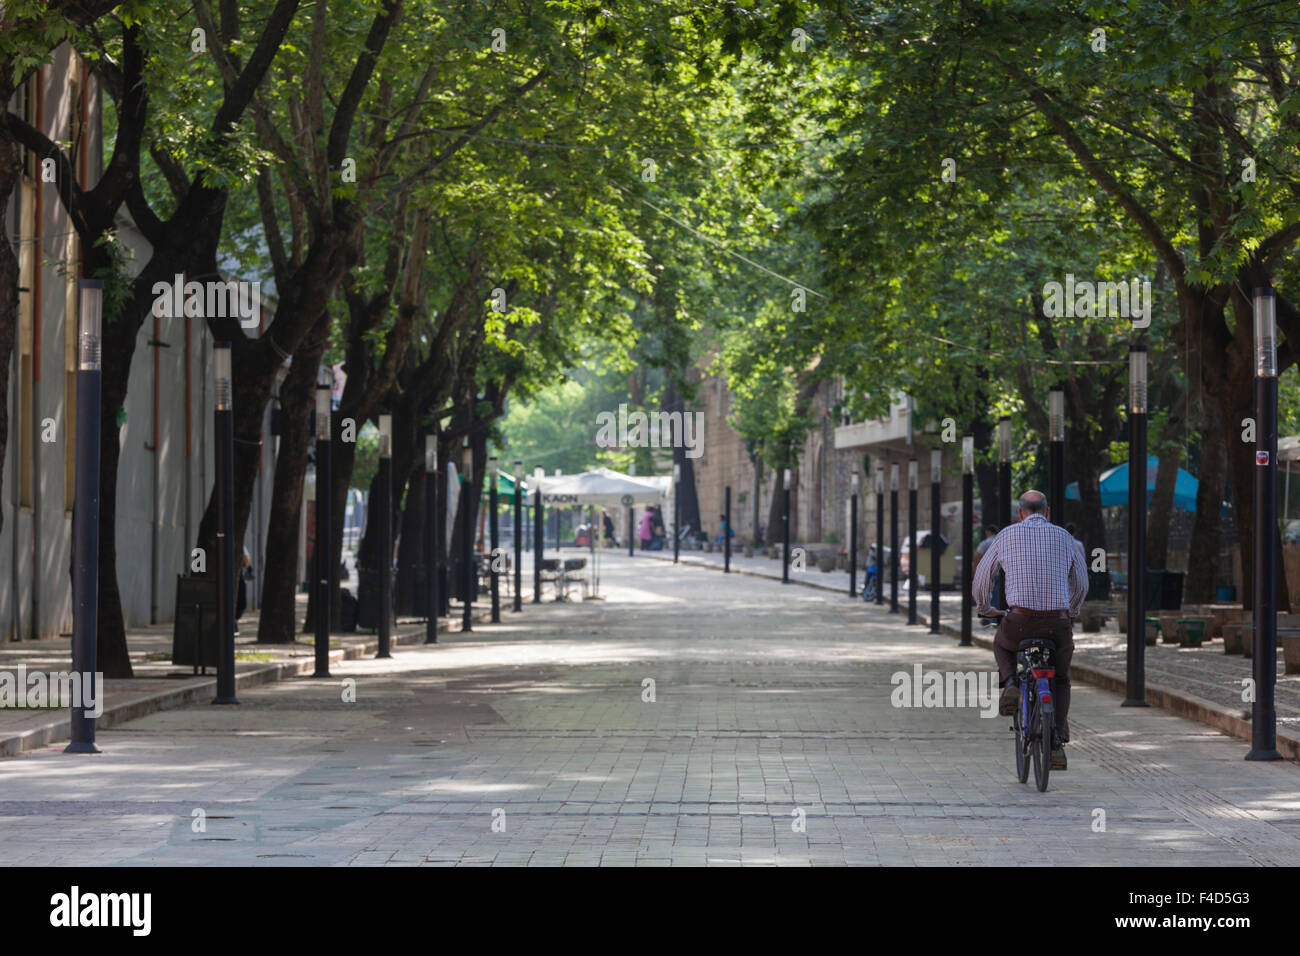 Albania, Tirana, Murat Toptani pedestrian street - Stock Image